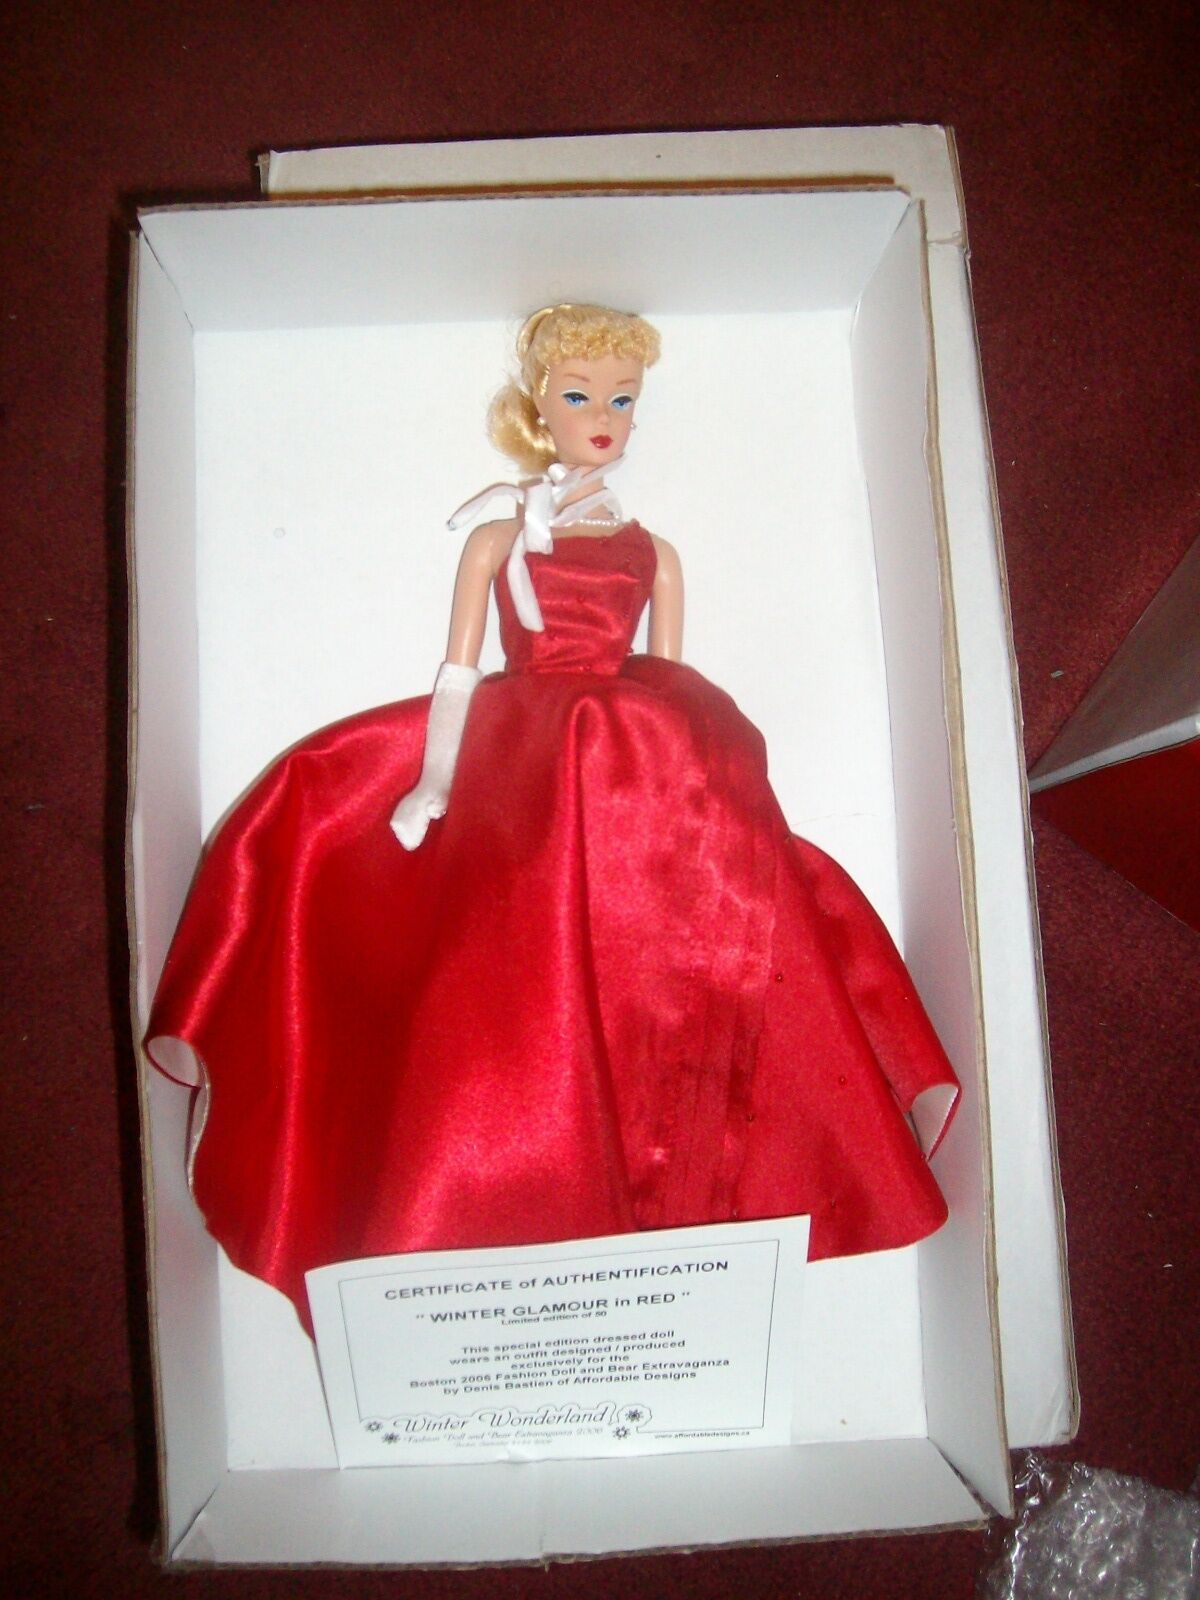 2006  invierno glamour en rojo  Muñeca Barbie Covention Denis Bastien Raro 50 hecho WW